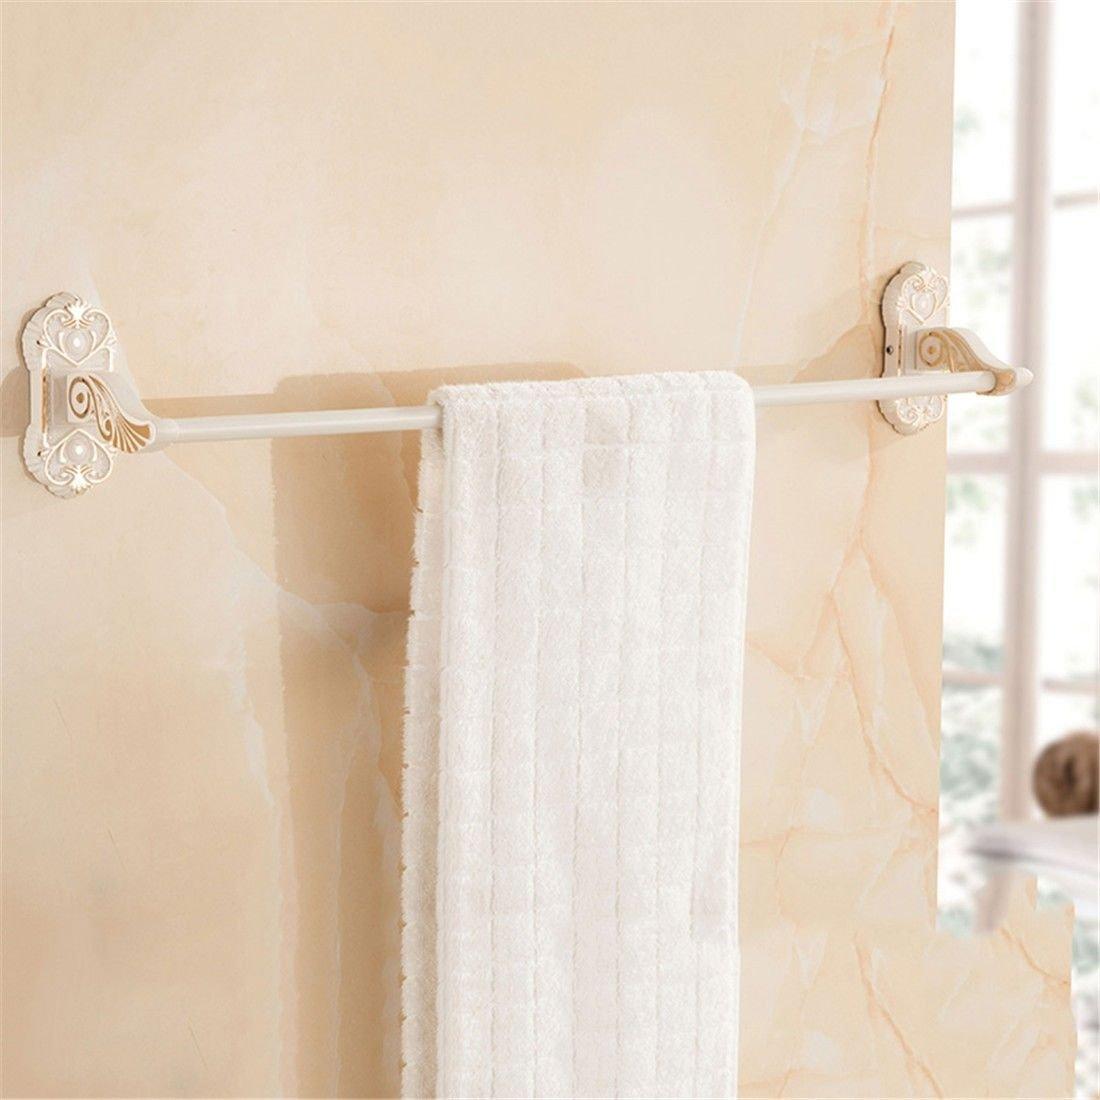 Yomiokla Bathroom Accessories - Kitchen, Toilet, Balcony and Bathroom Metal Towel Ring European Space Aluminum White Single Lever Double Lever Part 1